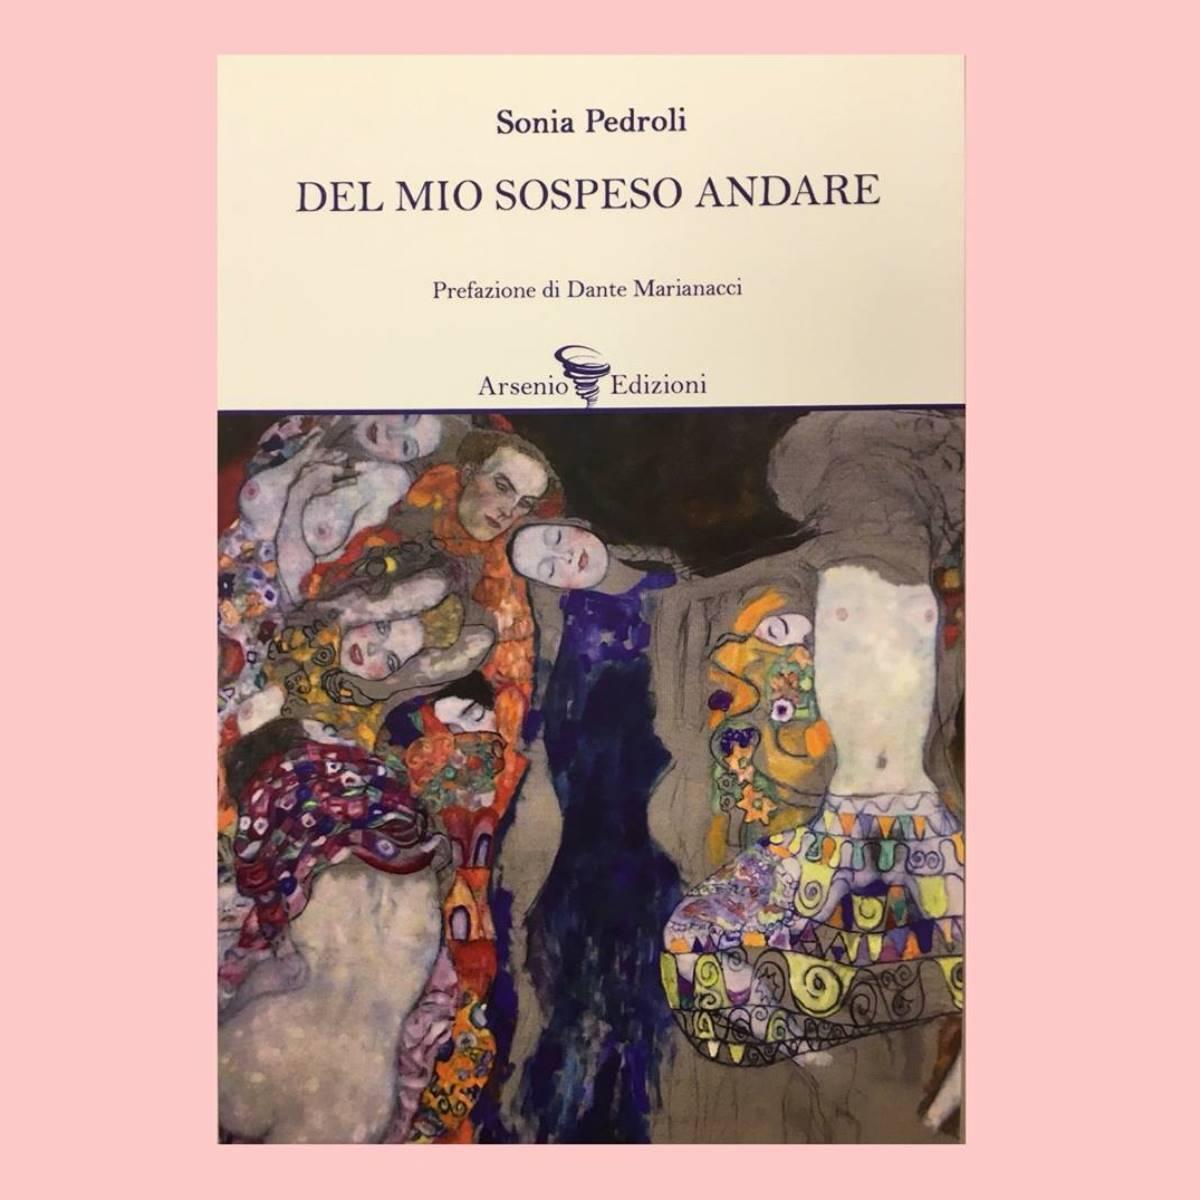 Sonia Pedroli presenta libro venerdì 18 giugno 2021 foto